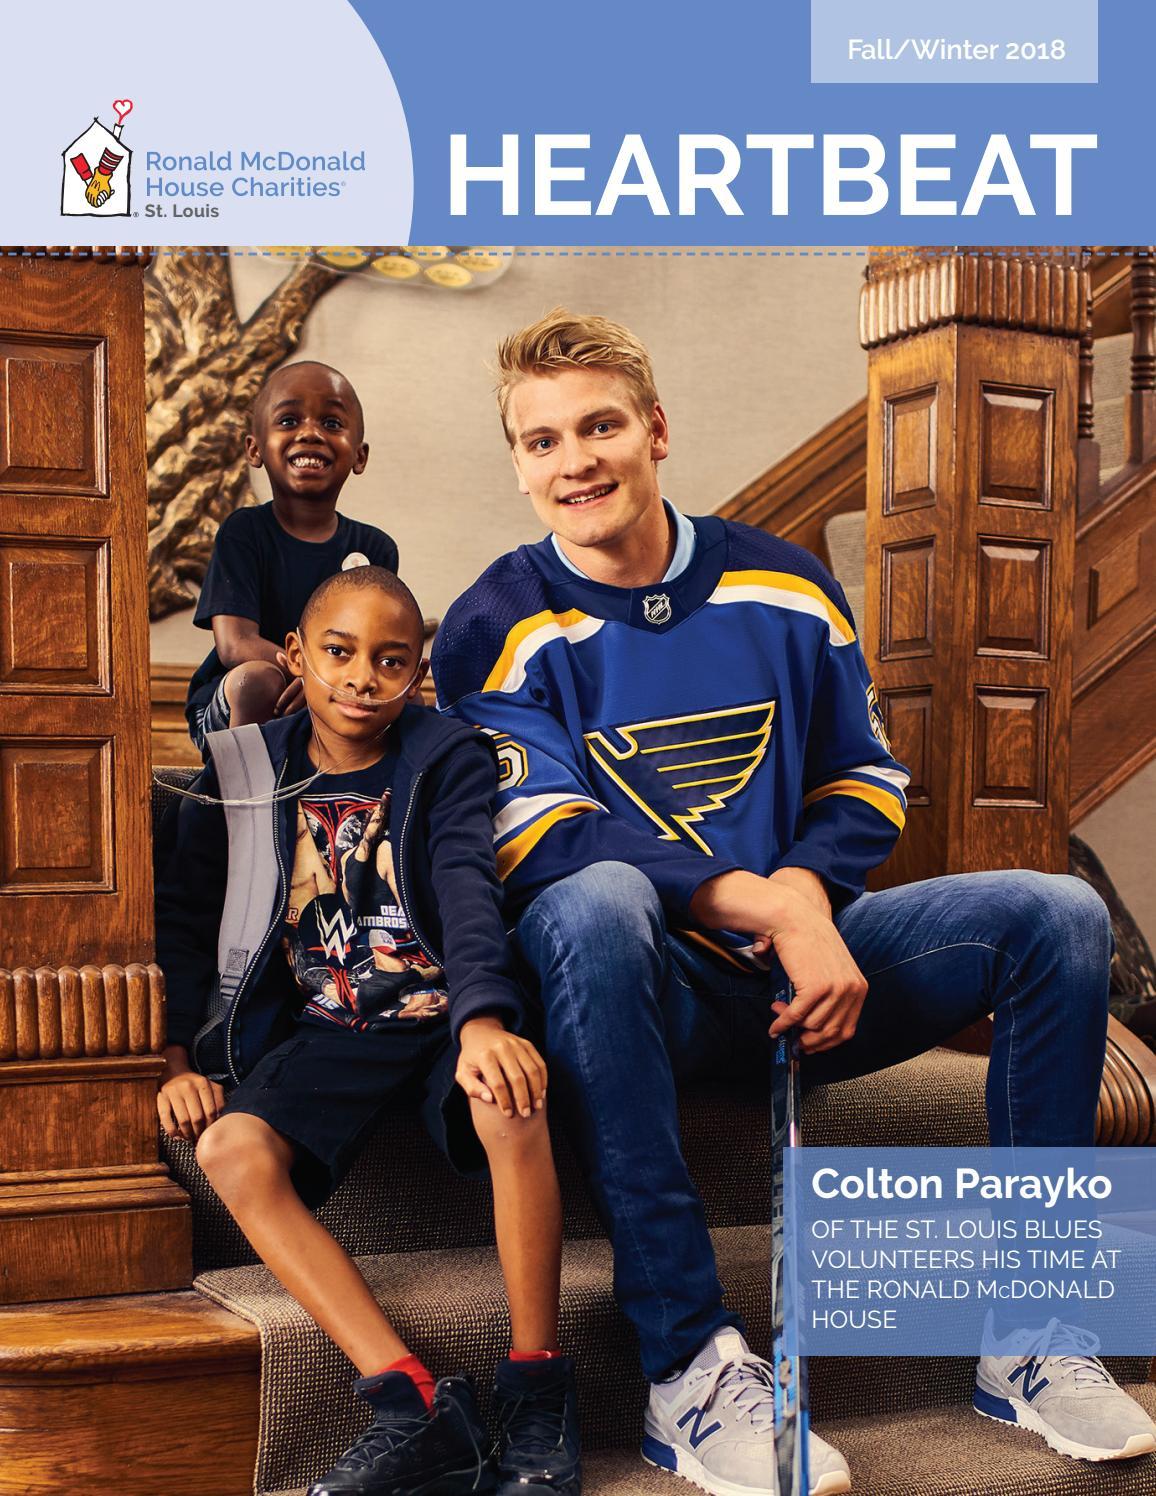 f943cc8e33a Fall Winter 2018 Heartbeat Newsletter by Ronald McDonald House ...